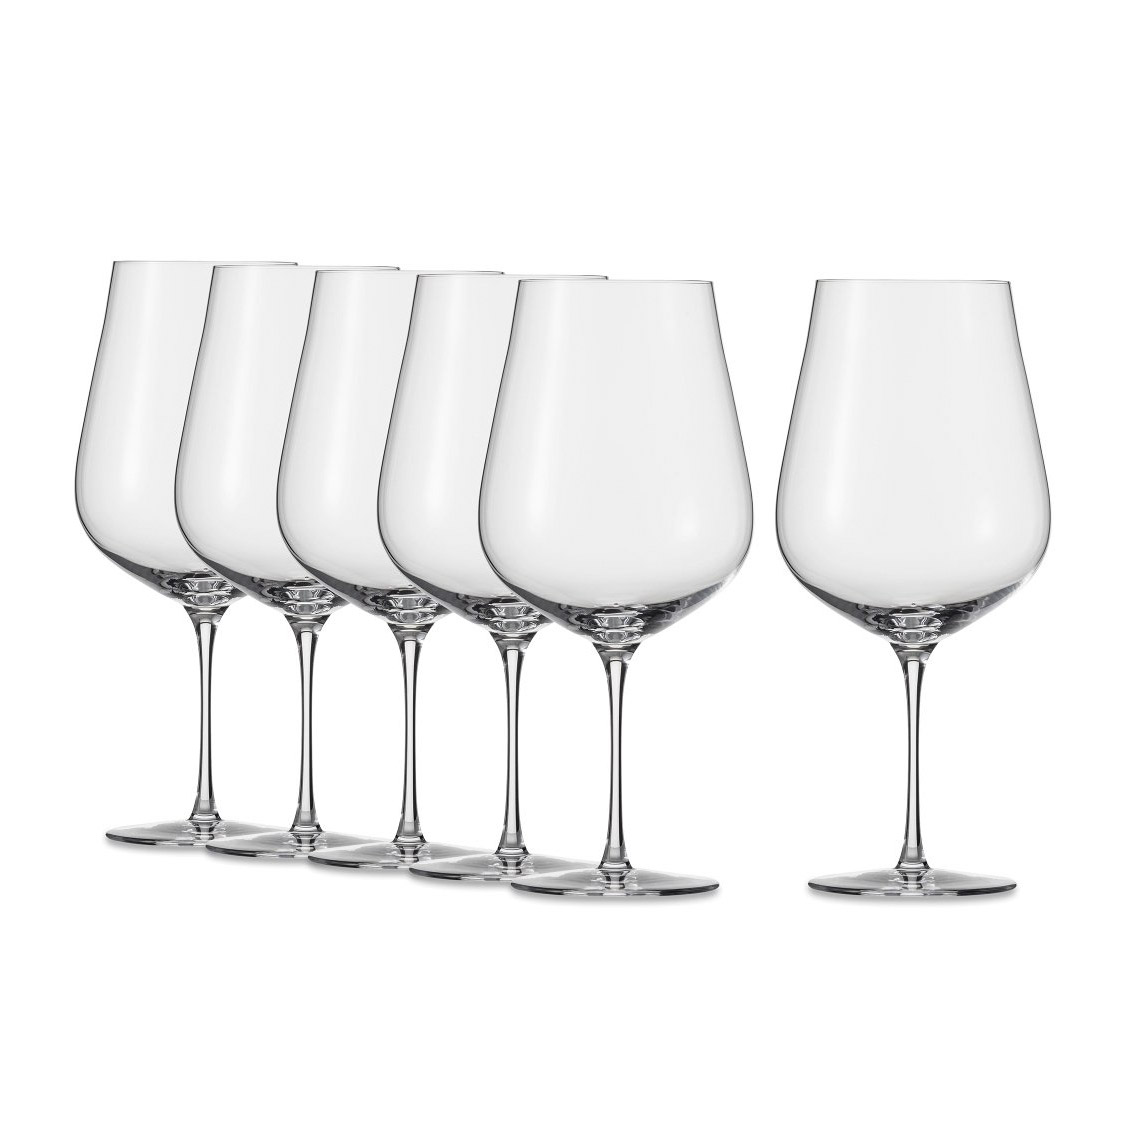 Набор бокалов для красного вина Schott Zwiesel Air Bordeaux 827 мл 6 шт набор бокалов для красного вина 612 мл 6 шт schott zwiesel diva 104 096 6